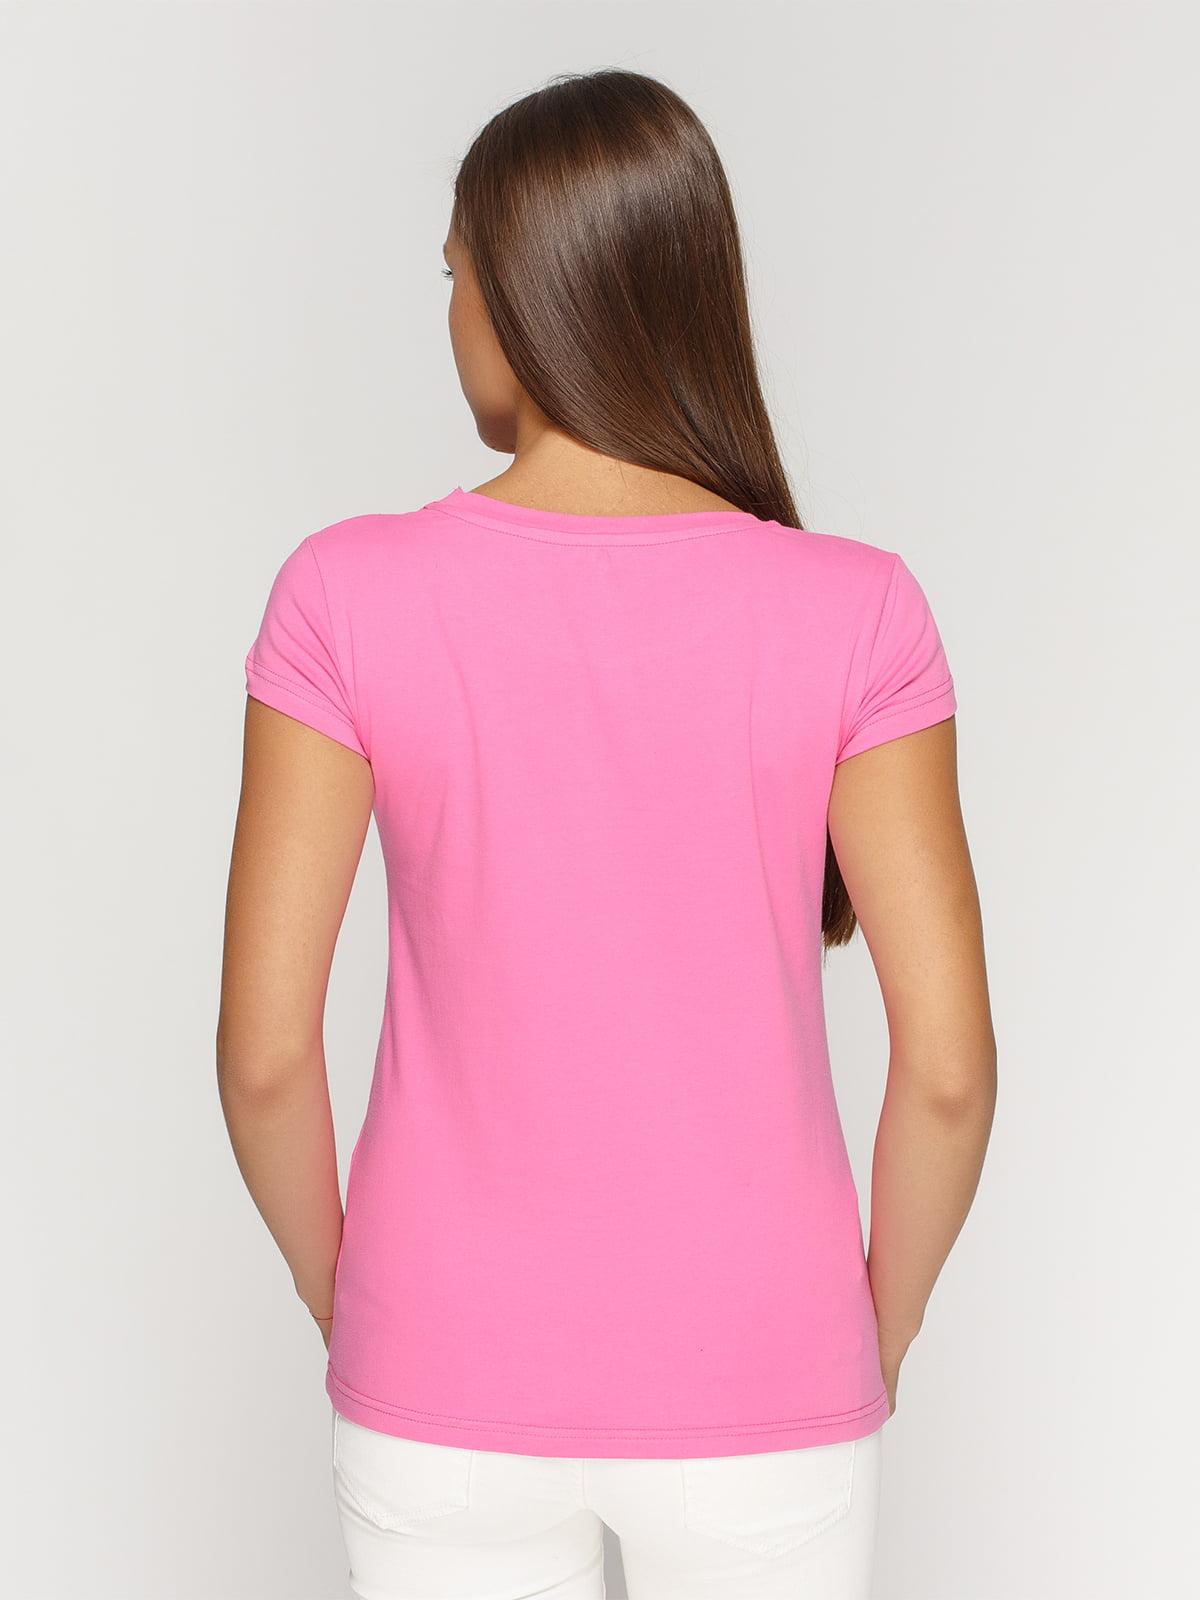 Футболка рожева з принтом | 4578572 | фото 2